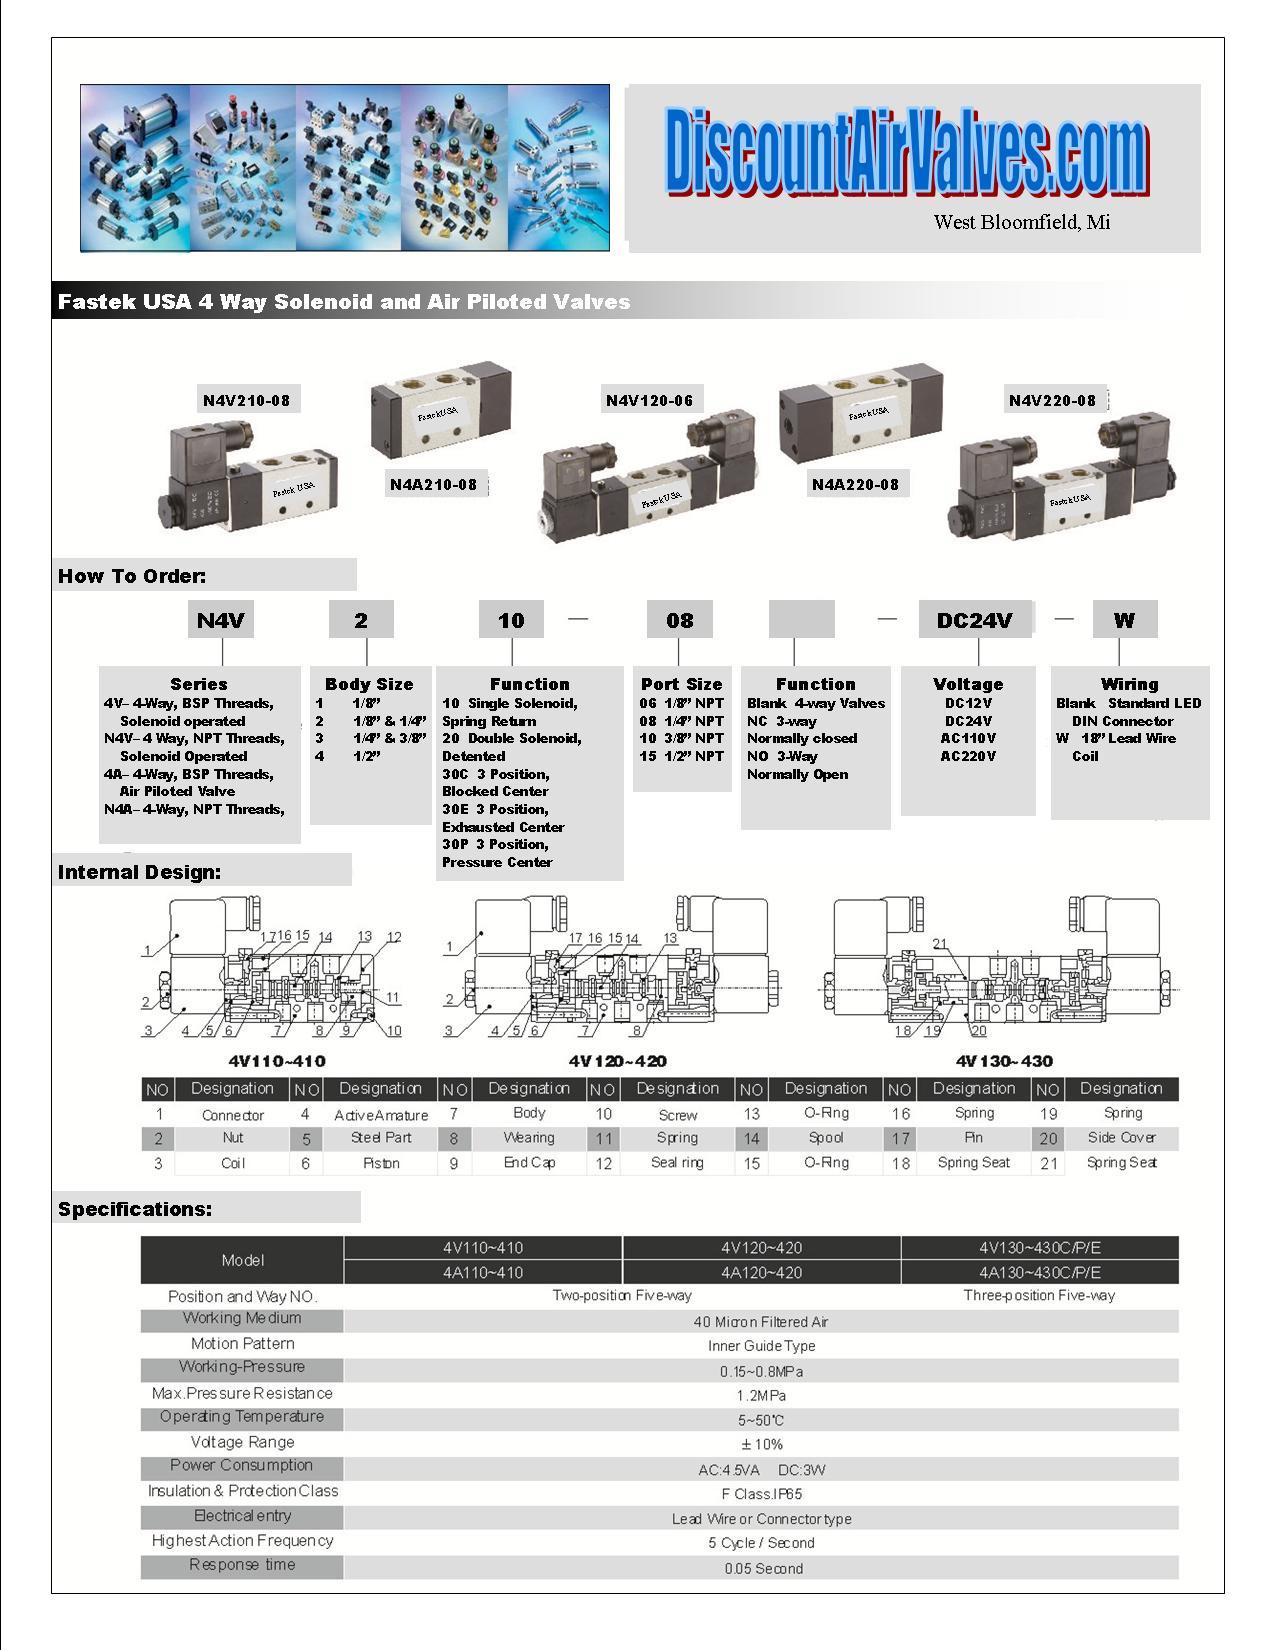 dwg N4V11 airtac solenoid valve 4v210 08, 1 4 bsp, single solenoid, specify airtac 4v210-08 wiring diagram at soozxer.org